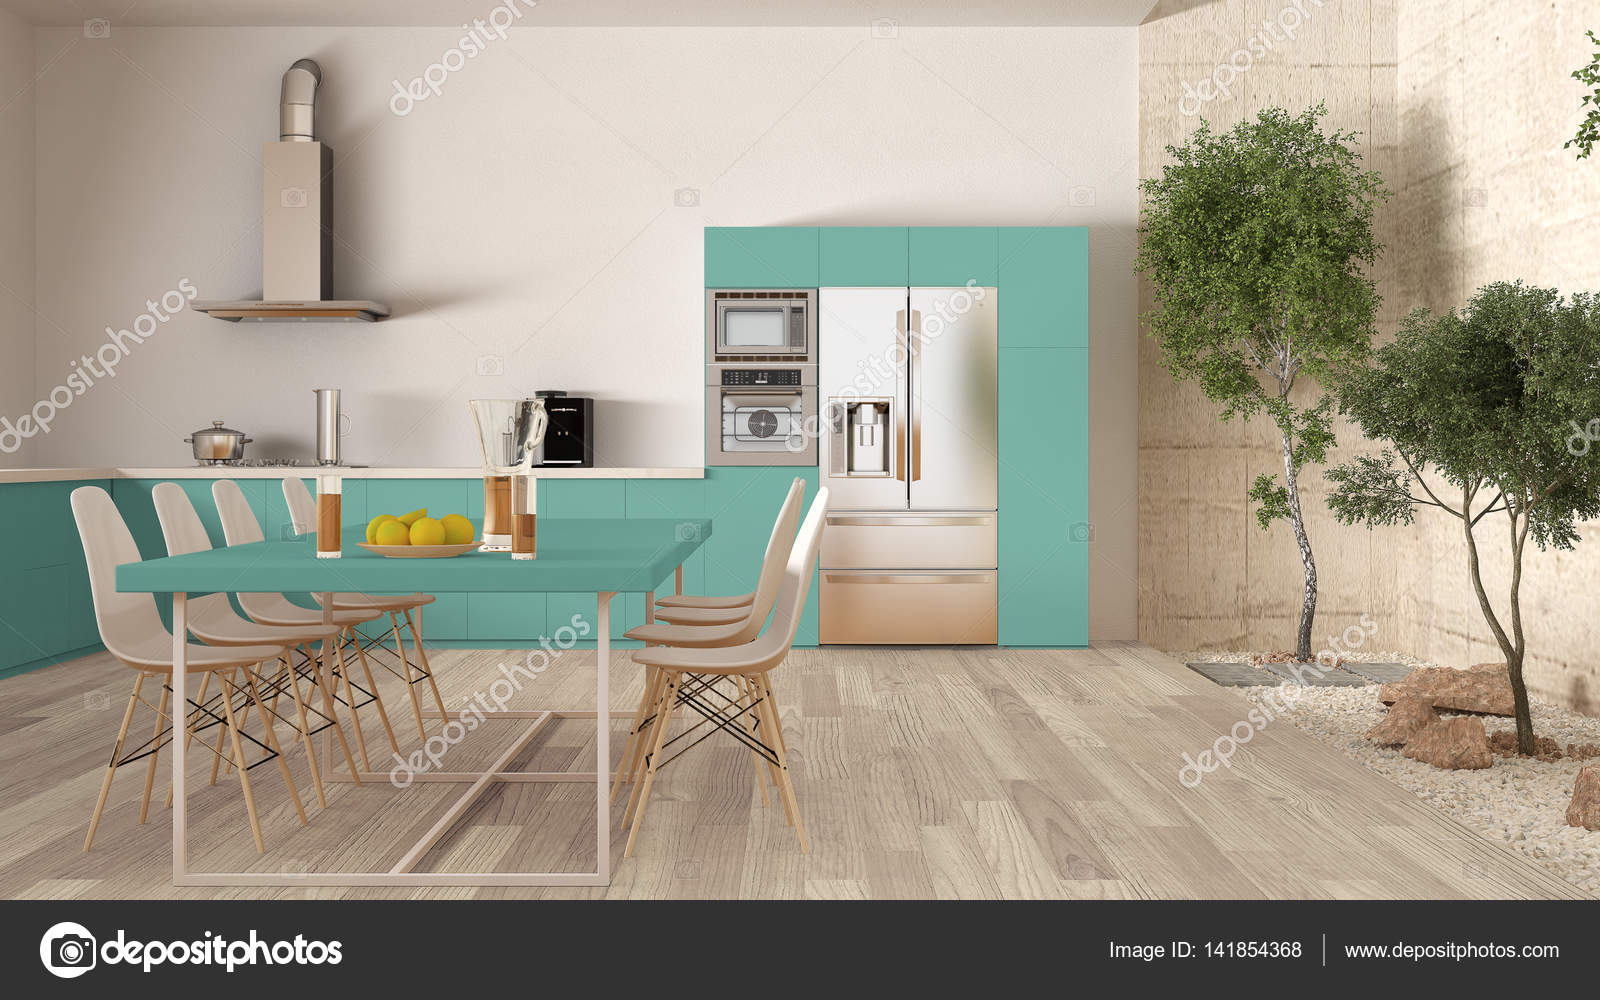 turquoise kitchen decor garage door 白和绿松石厨房内的花园 最小的内政 图库照片 c archiviz 141854368